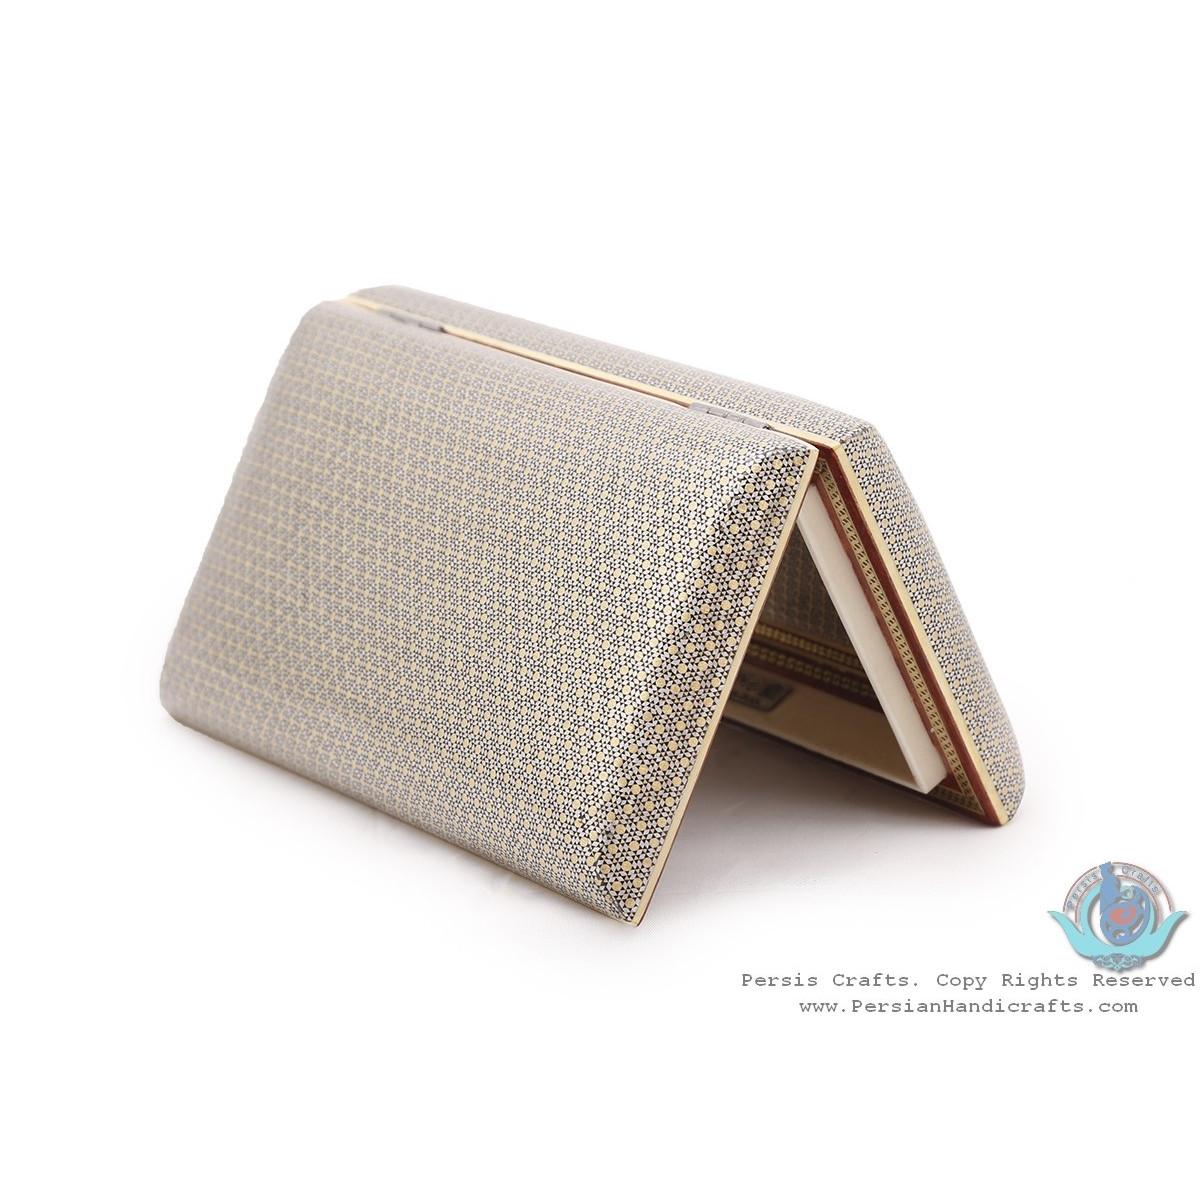 Privileged Fine Khatam Marquetry on Soup Shape Box  - HKH3917-Persian Handicrafts